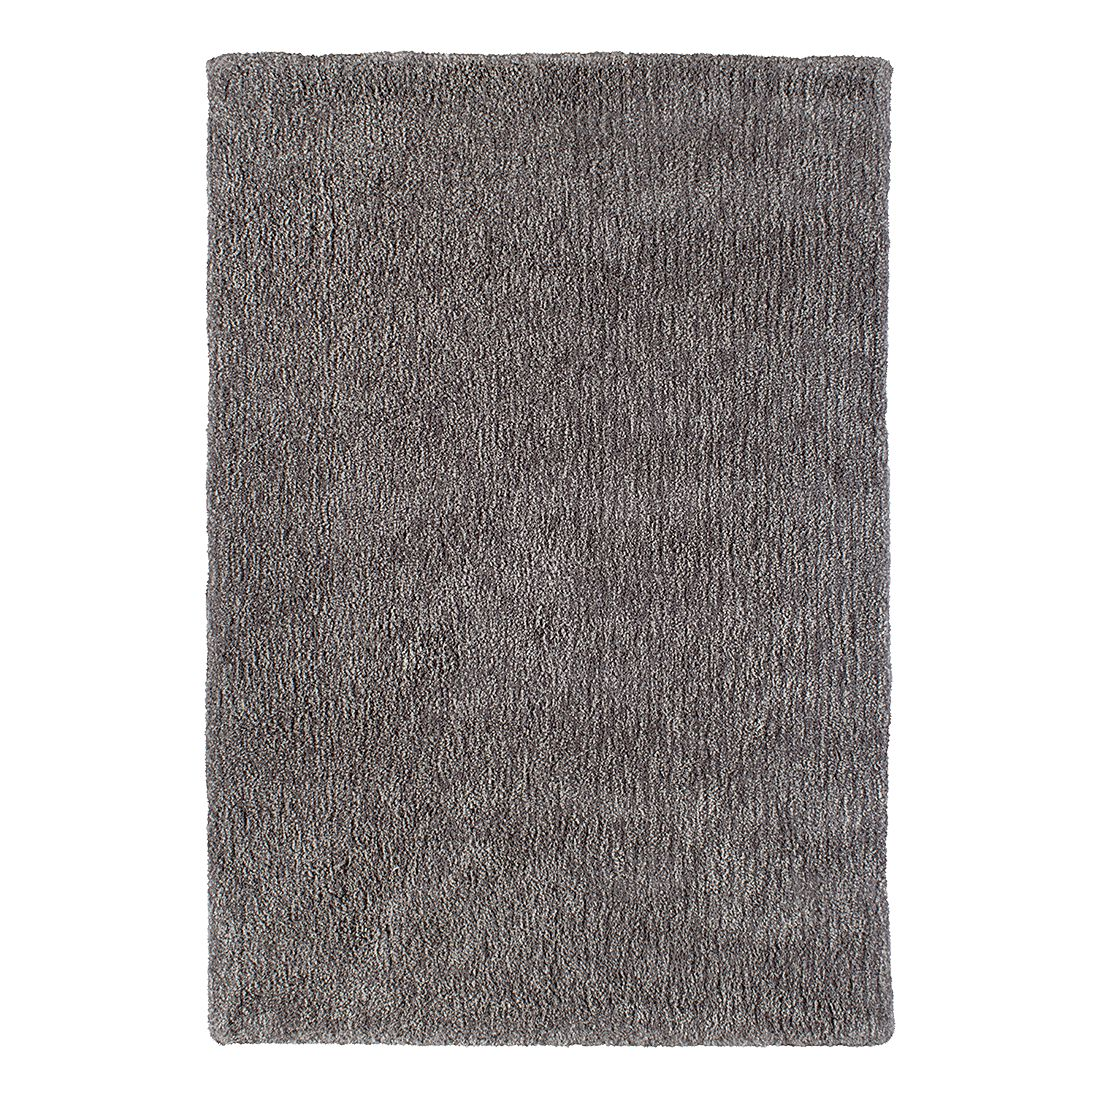 Teppich Touch – Taupe – 70 x 140 cm, barbara becker home passion jetzt kaufen